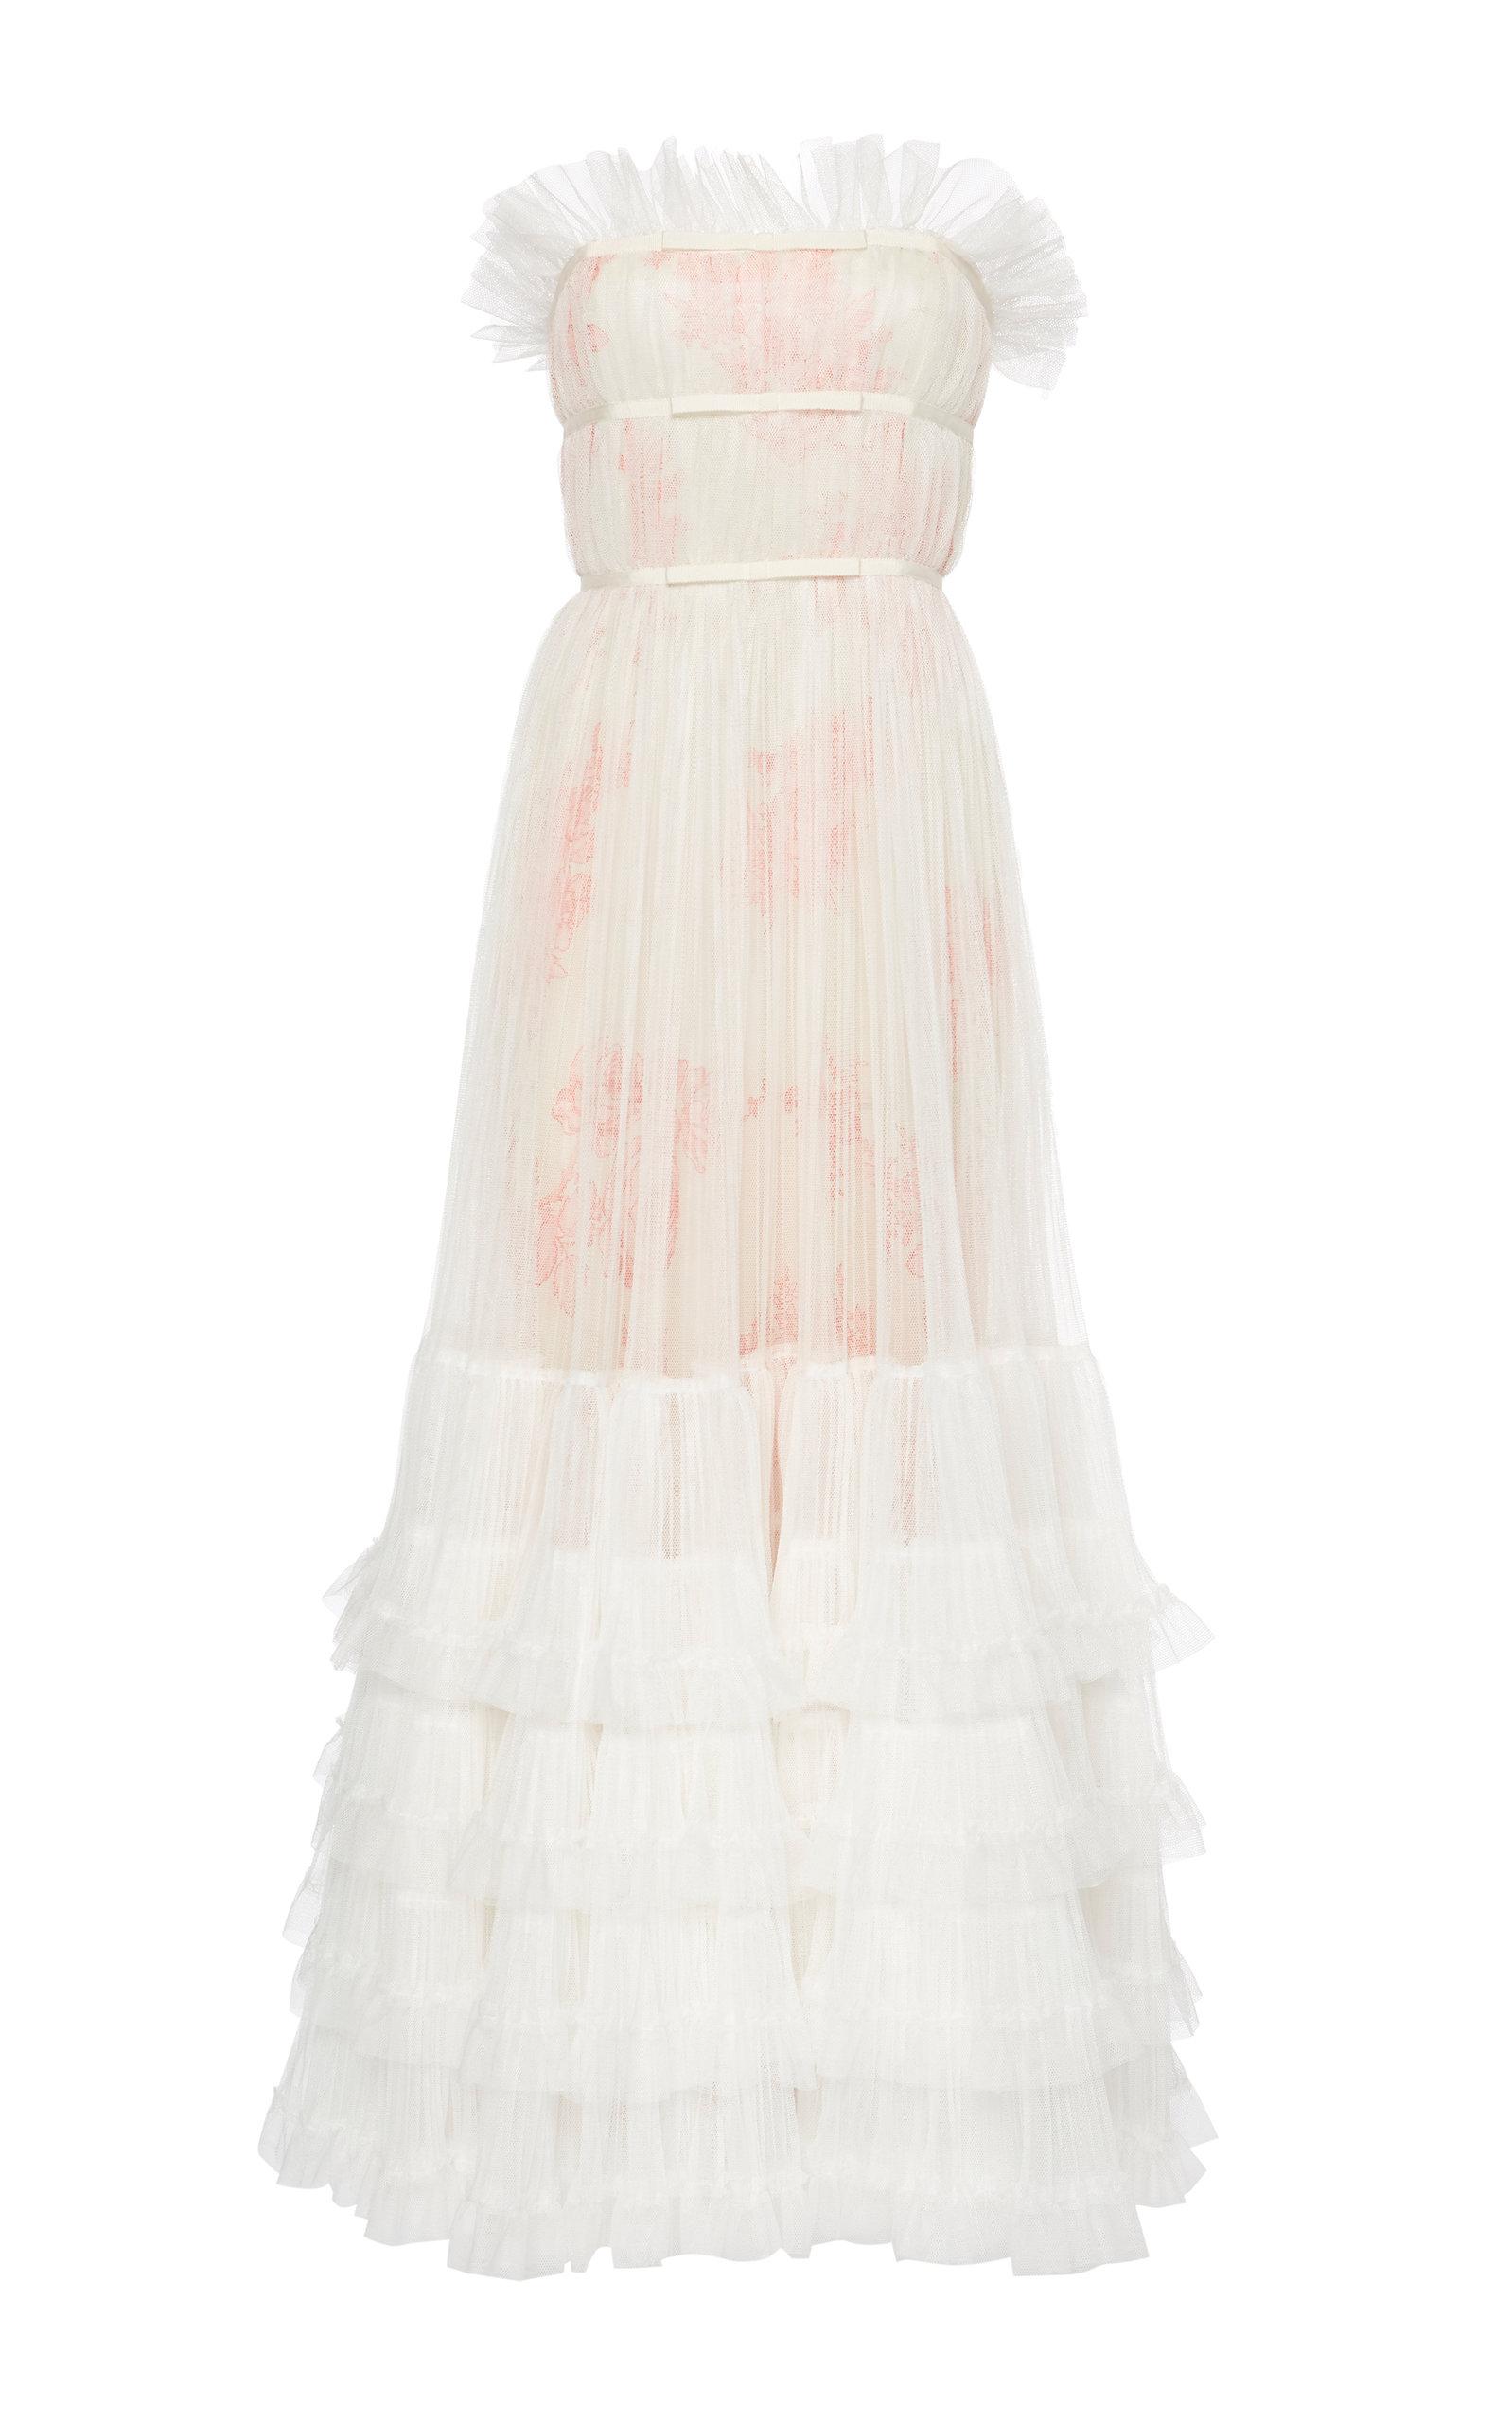 Buy Giambattista Valli Strapless Ruffled Tulle Gown online, shop Giambattista Valli at the best price